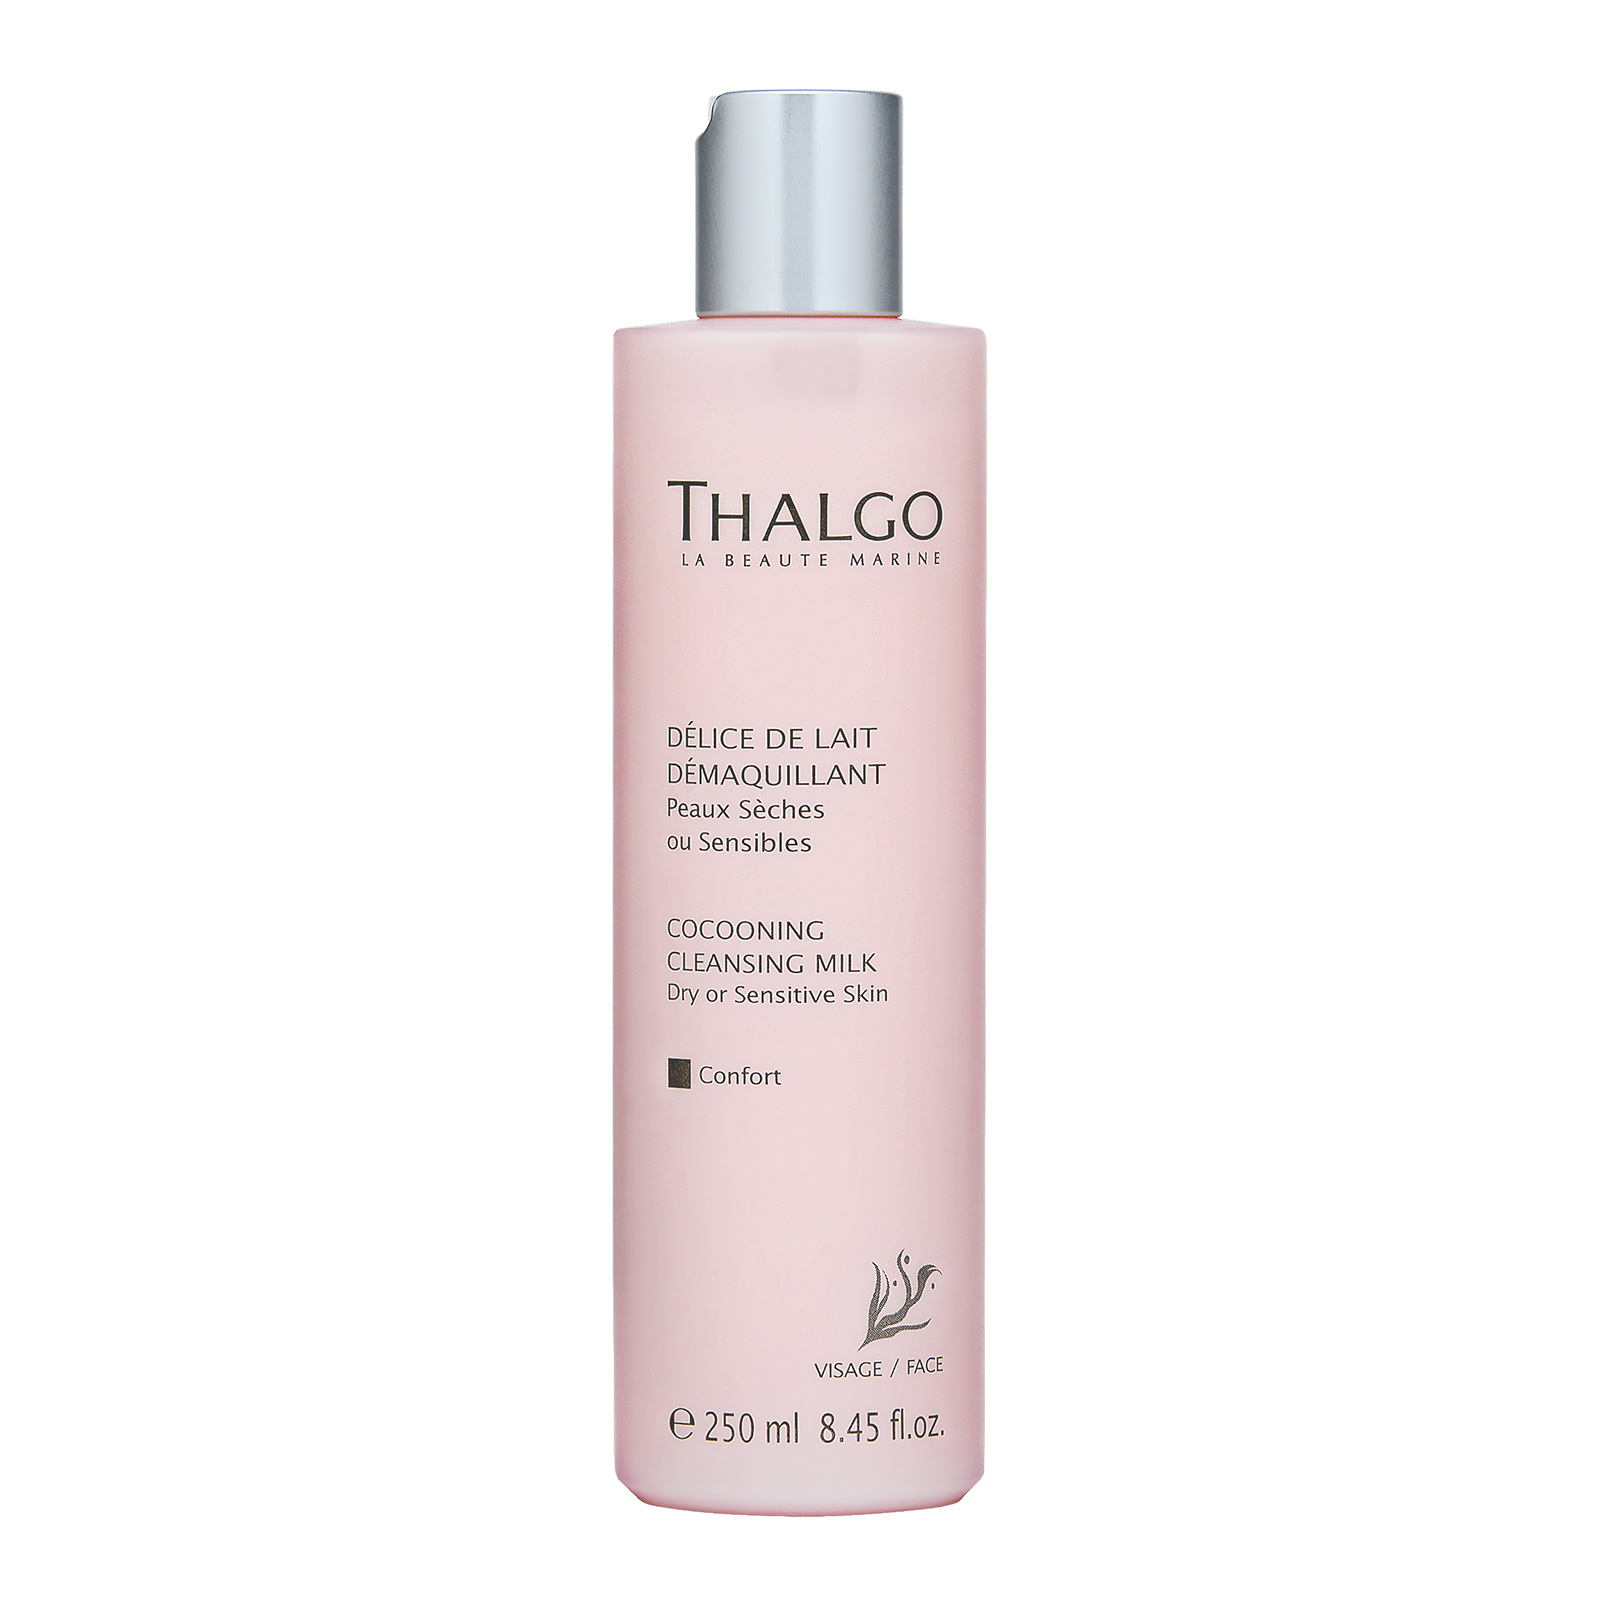 THALGO  Cocooning Cleansing Milk  (Dry or Sensitive Skin) 8.45oz, 250ml